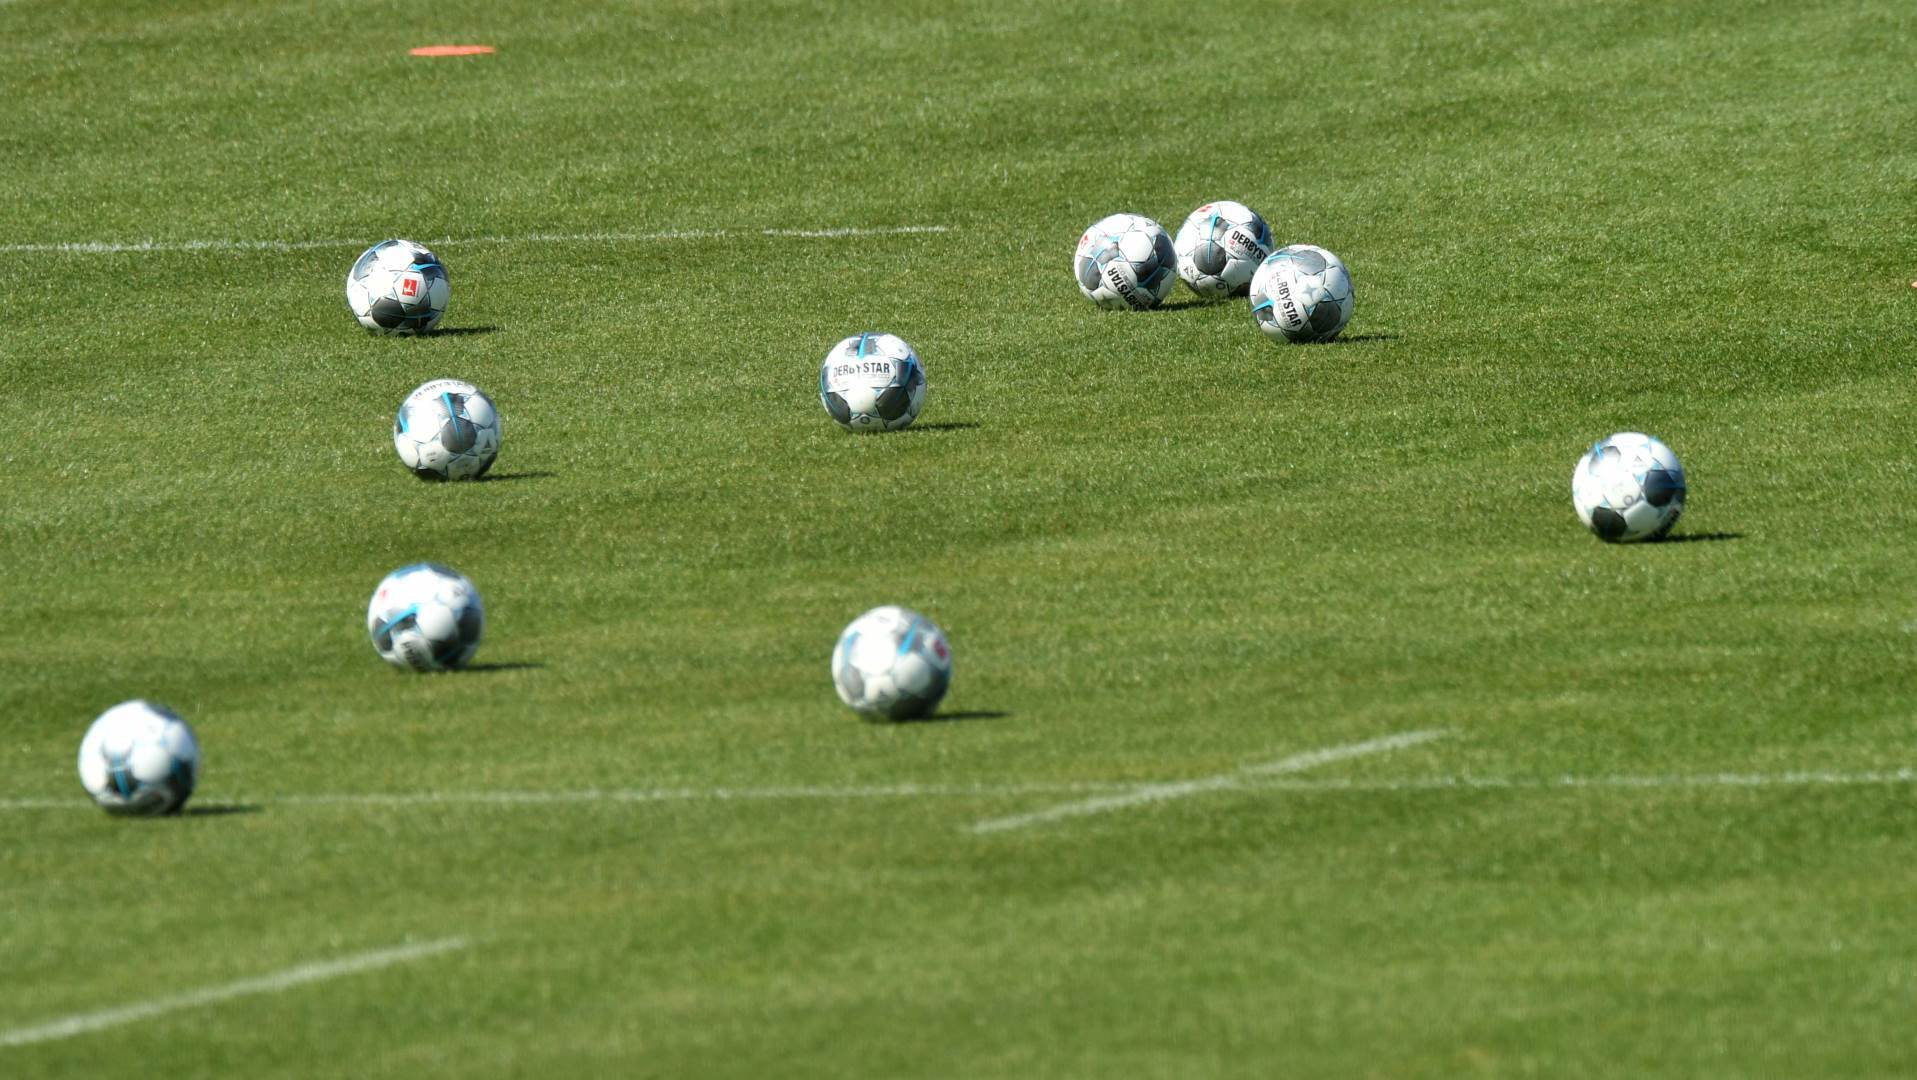 bajern minhen, pokrivalica, trening, fudbal